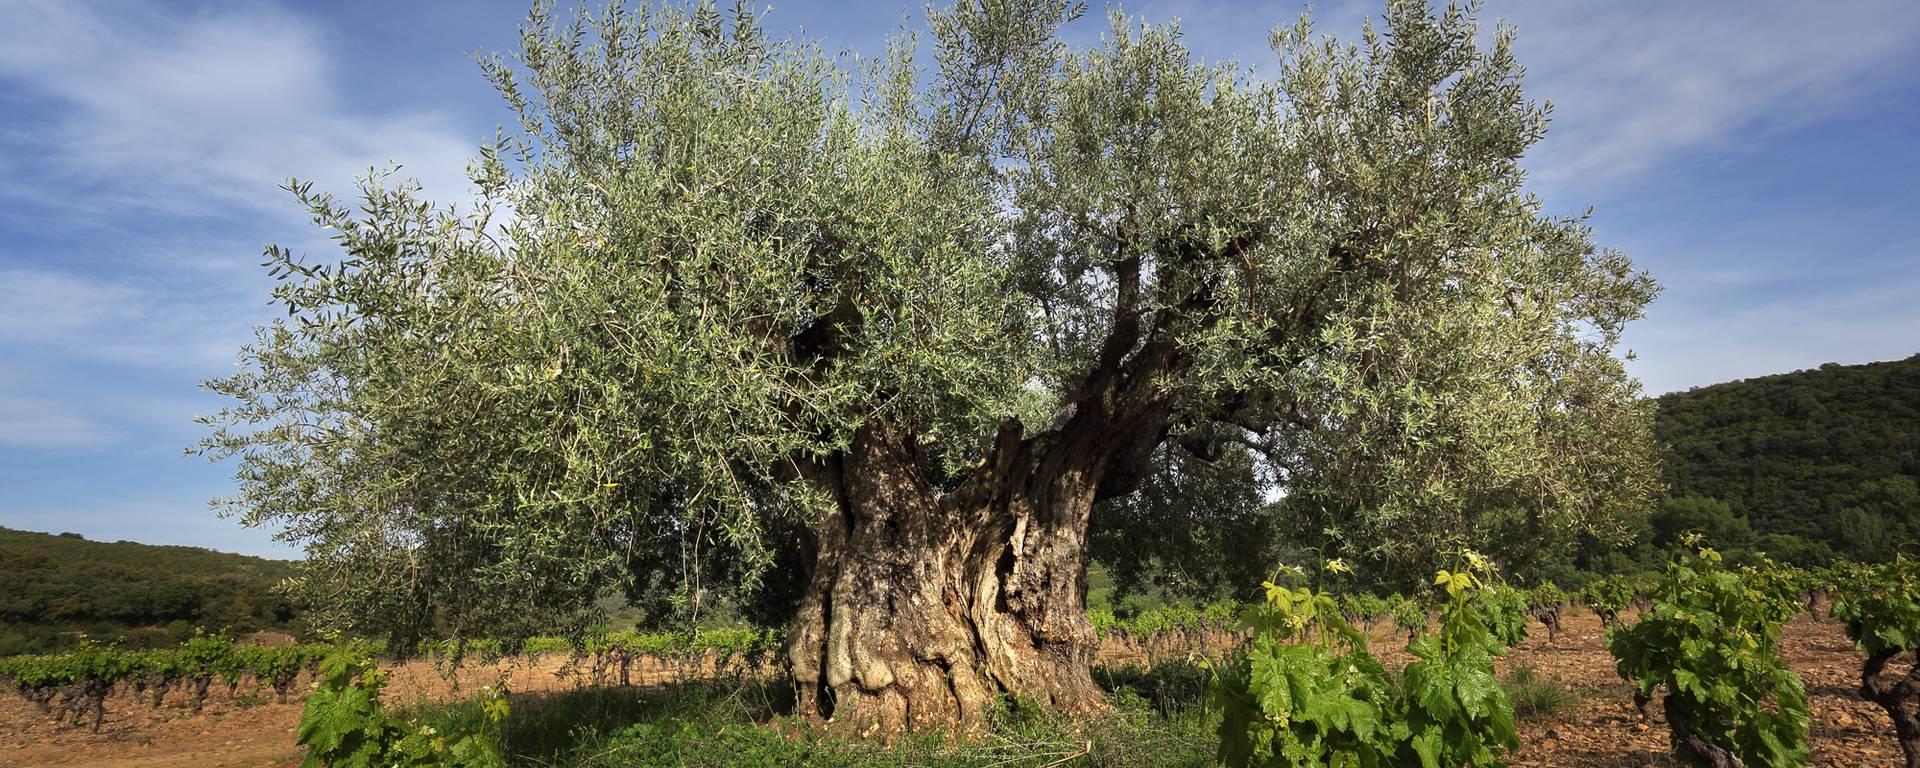 olivier et vignes